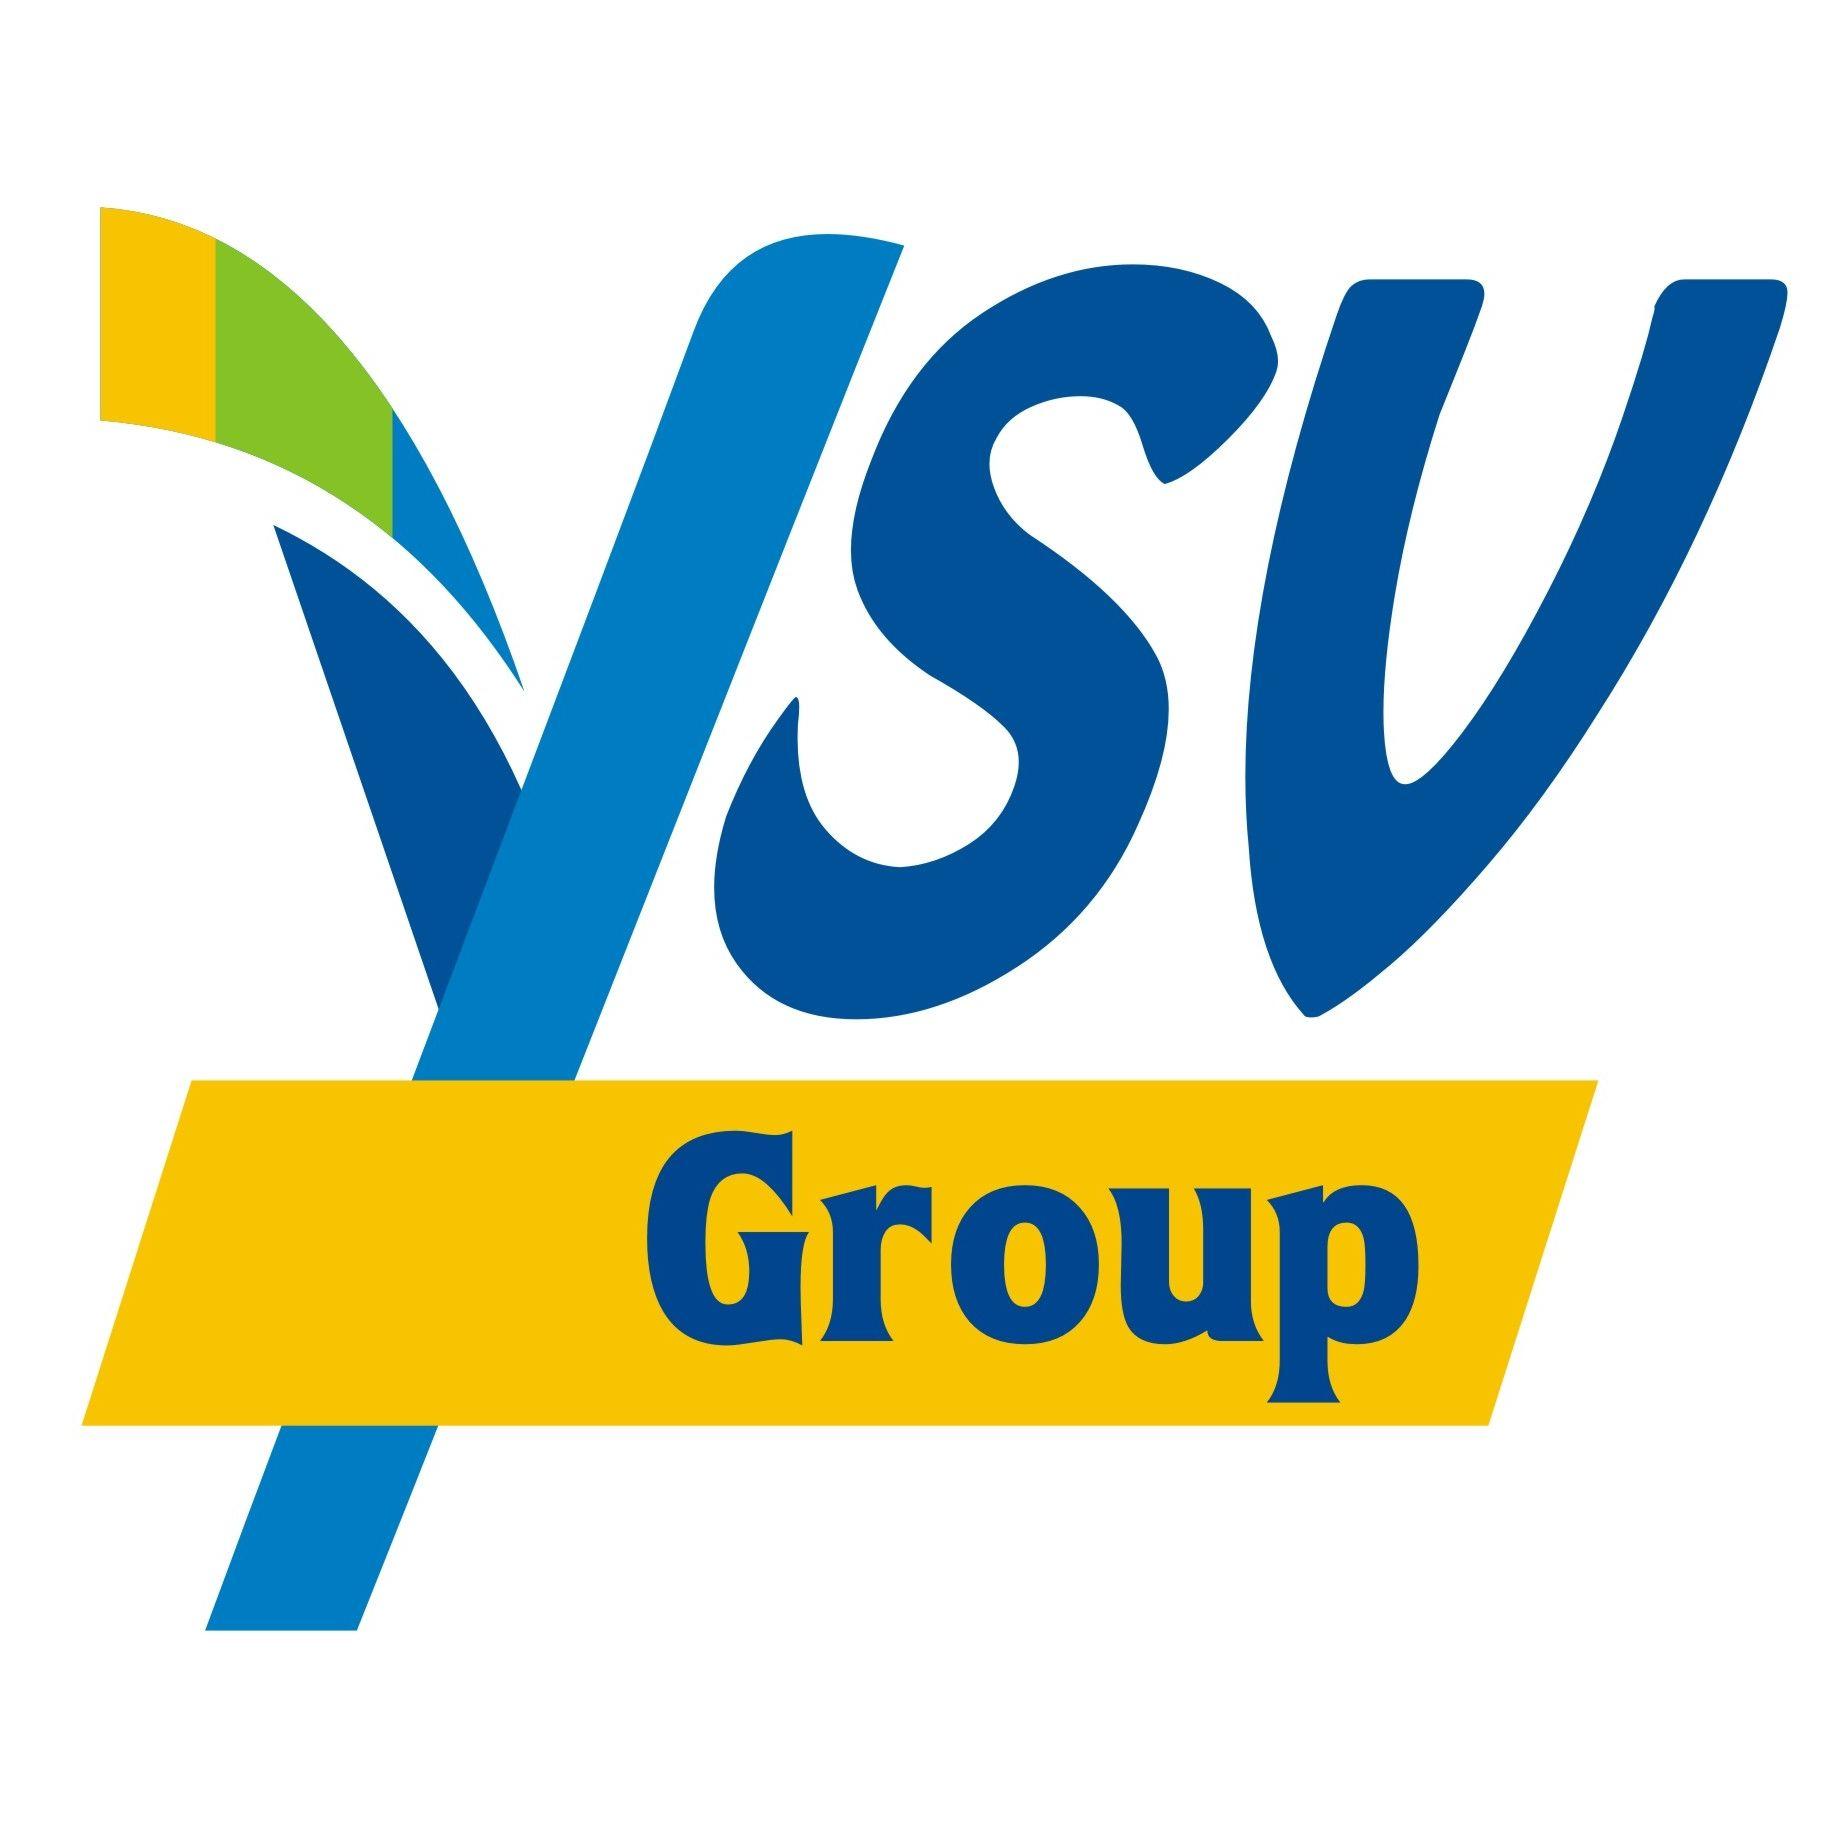 YSV group Logo